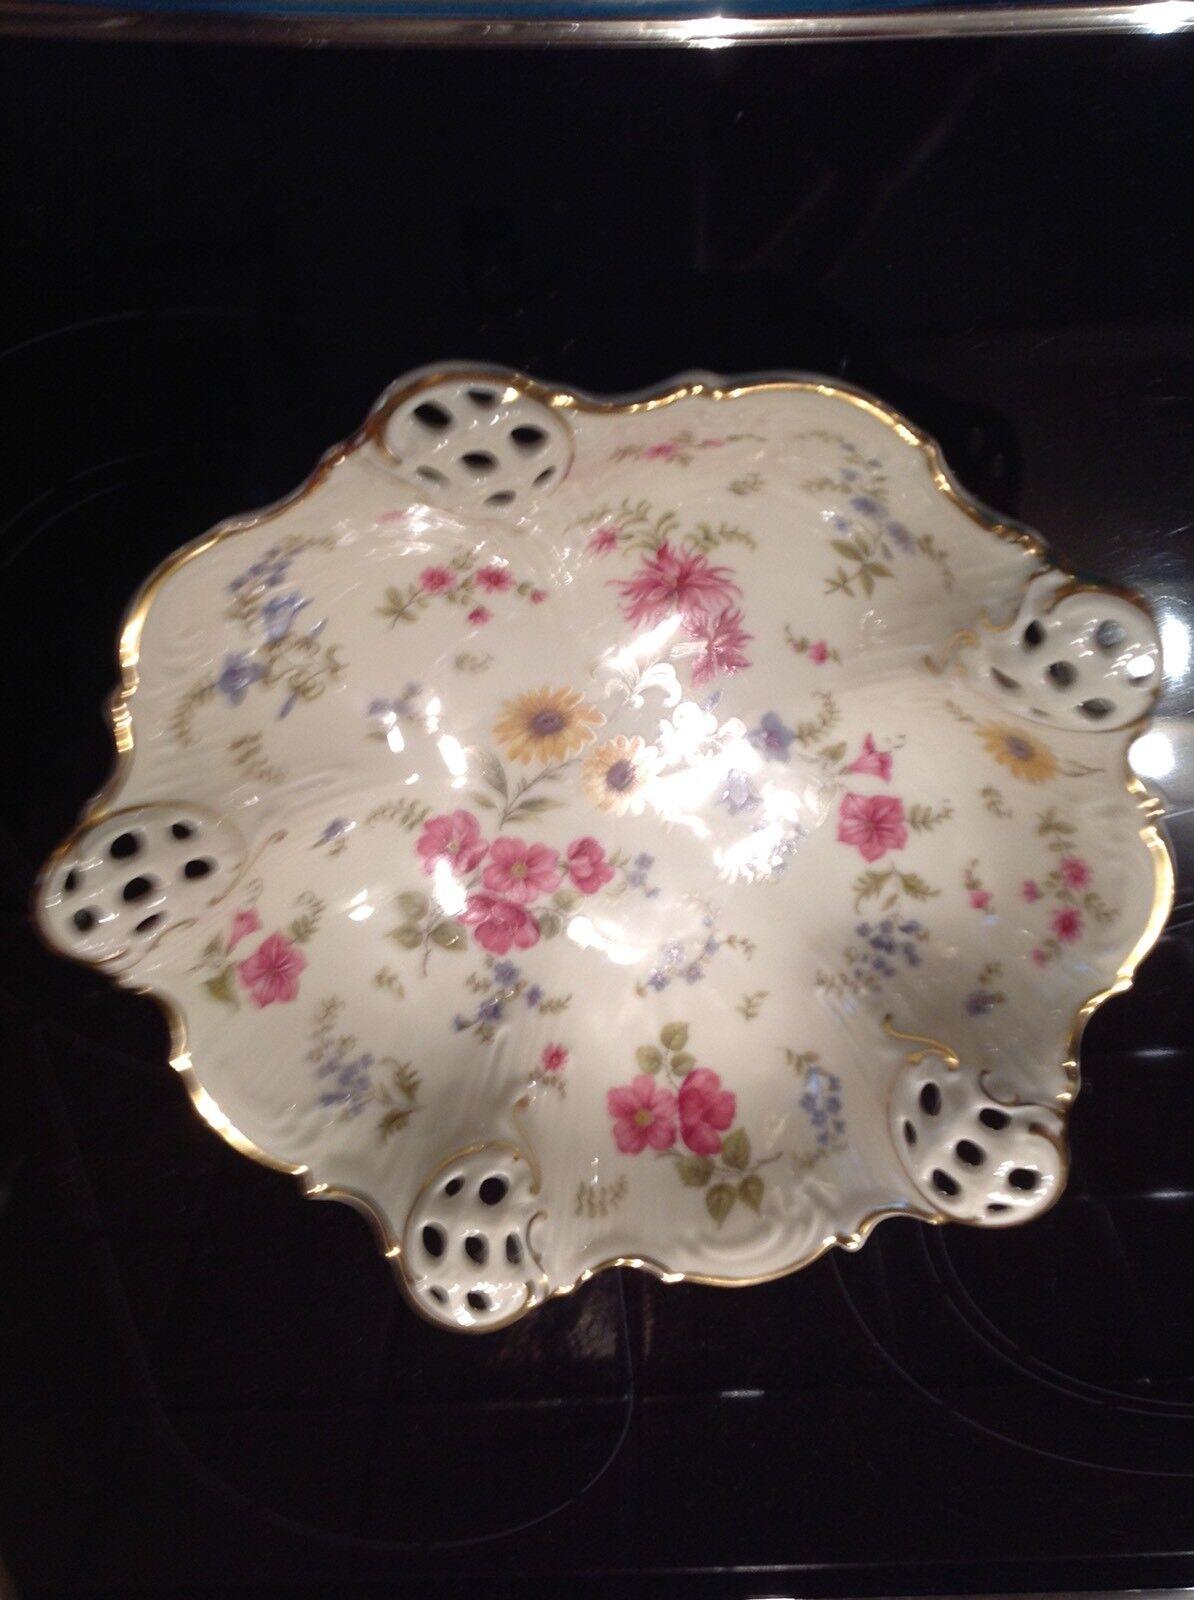 Porzellan Porzellan Porzellan Schüssel | Schön  0c2394